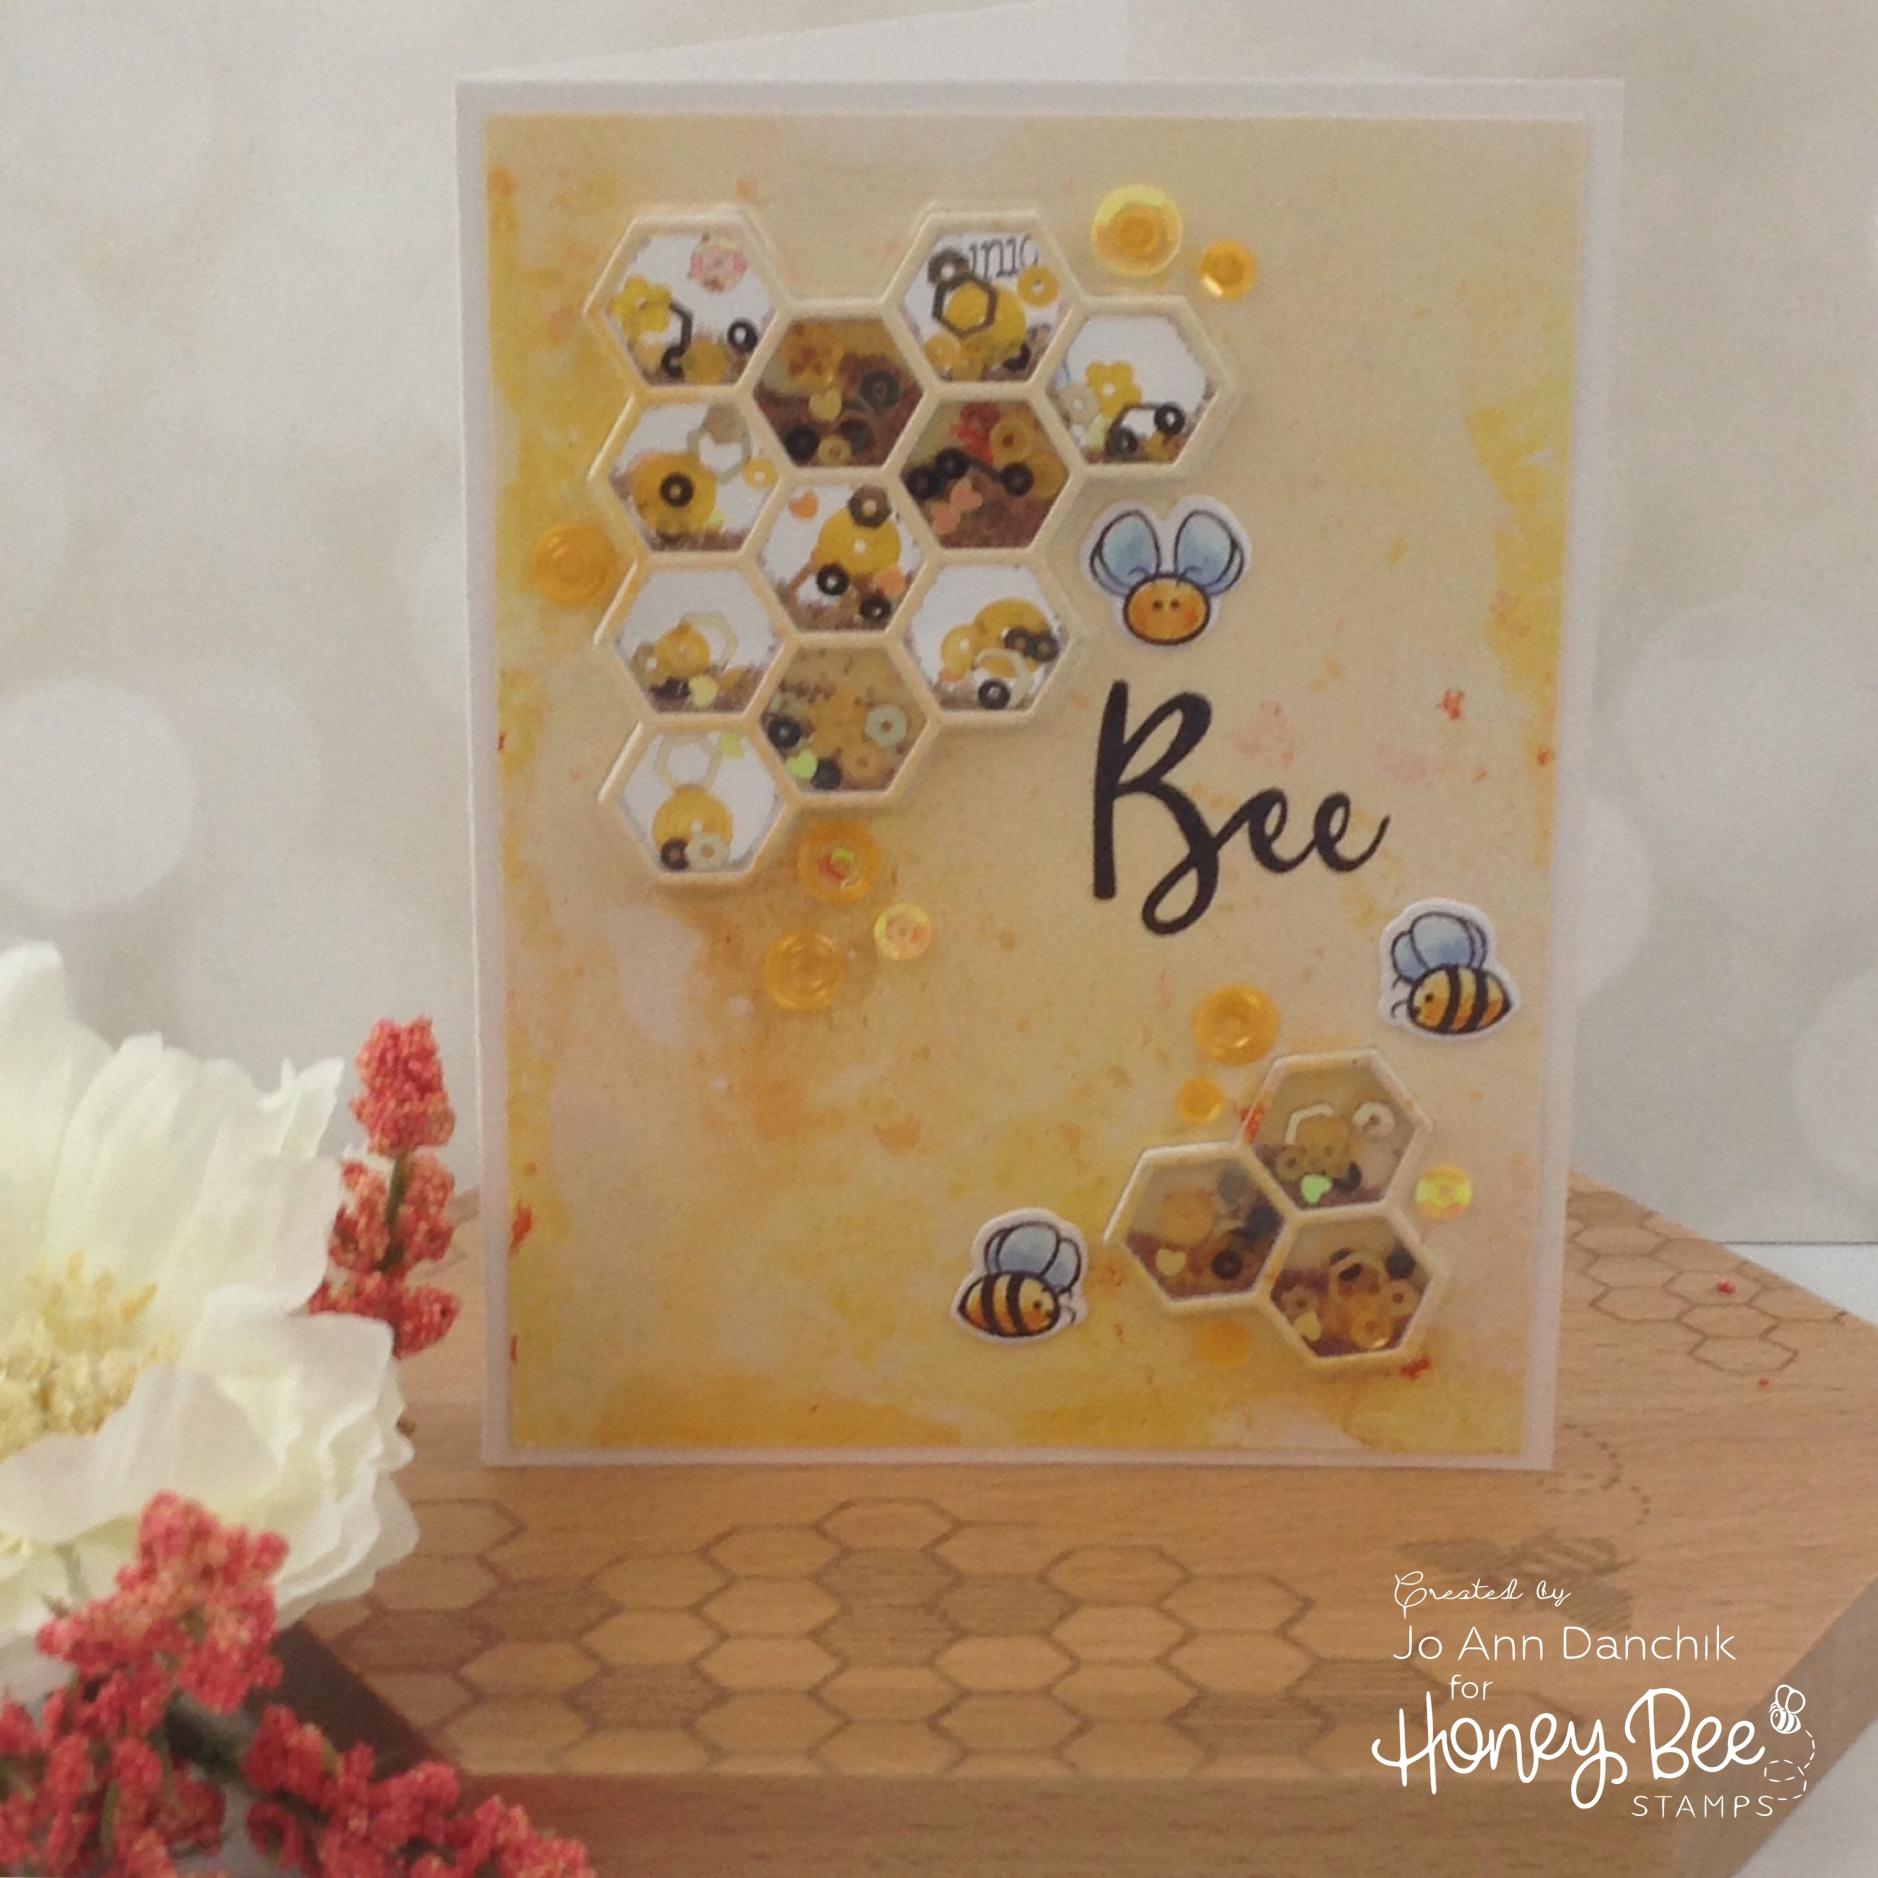 Creative Sundays With Jo Ann: Bee Unique